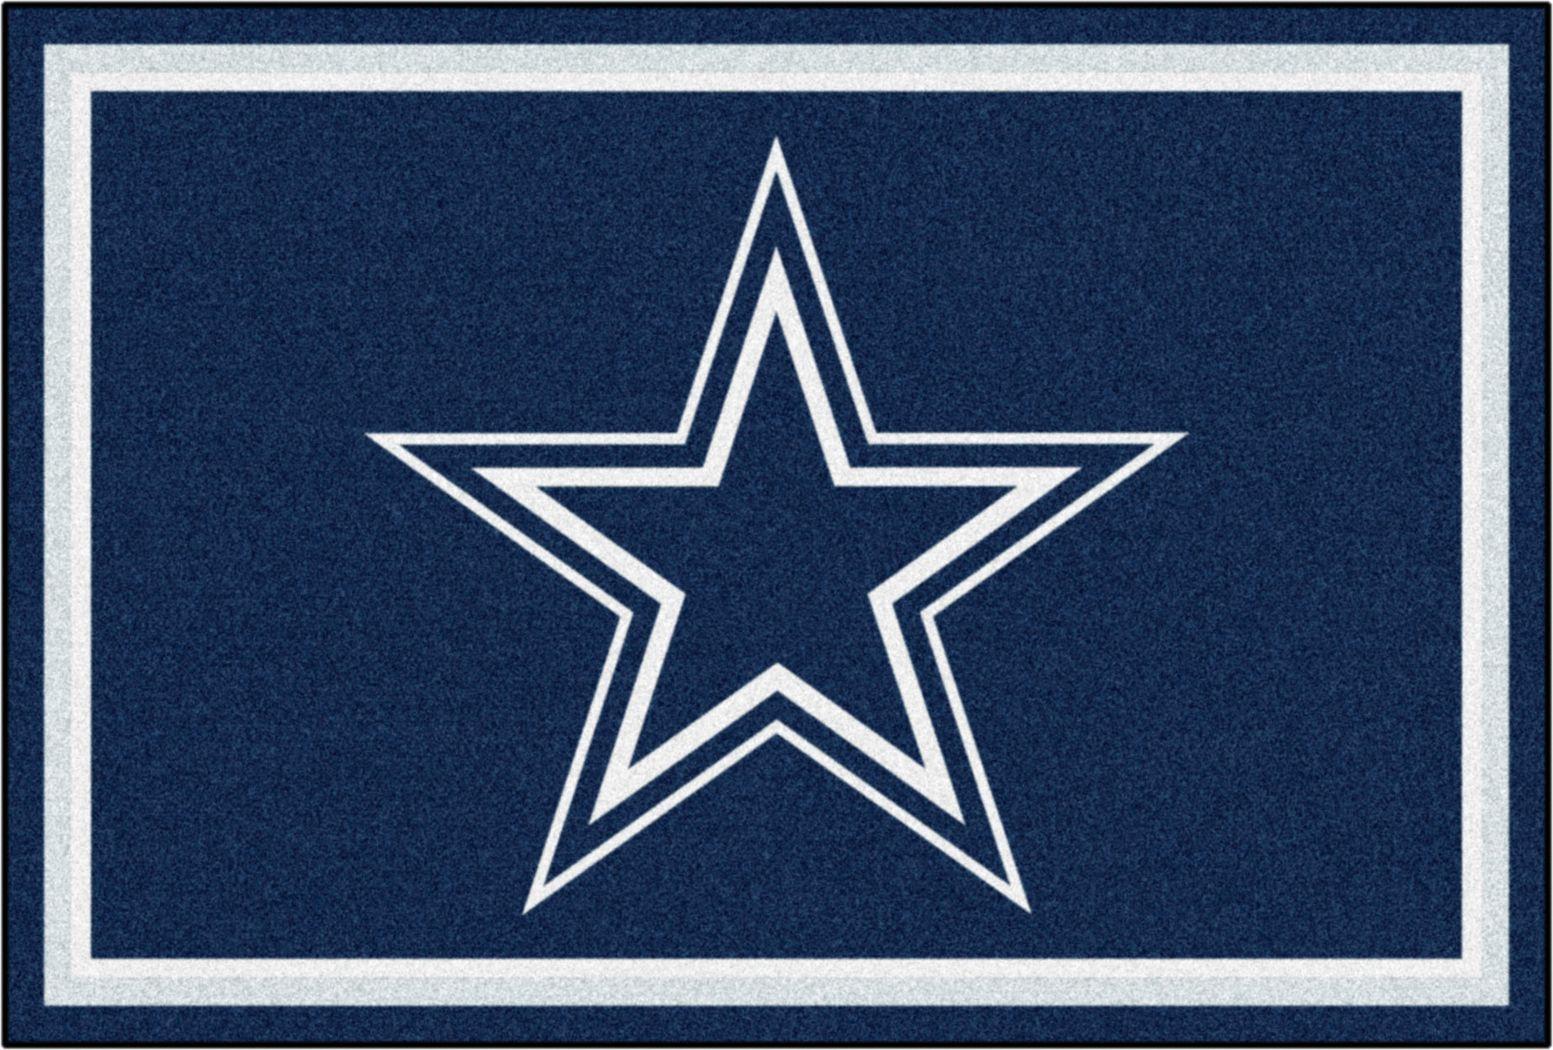 NFL Big Game Dallas Cowboys 5' x 8' Rug